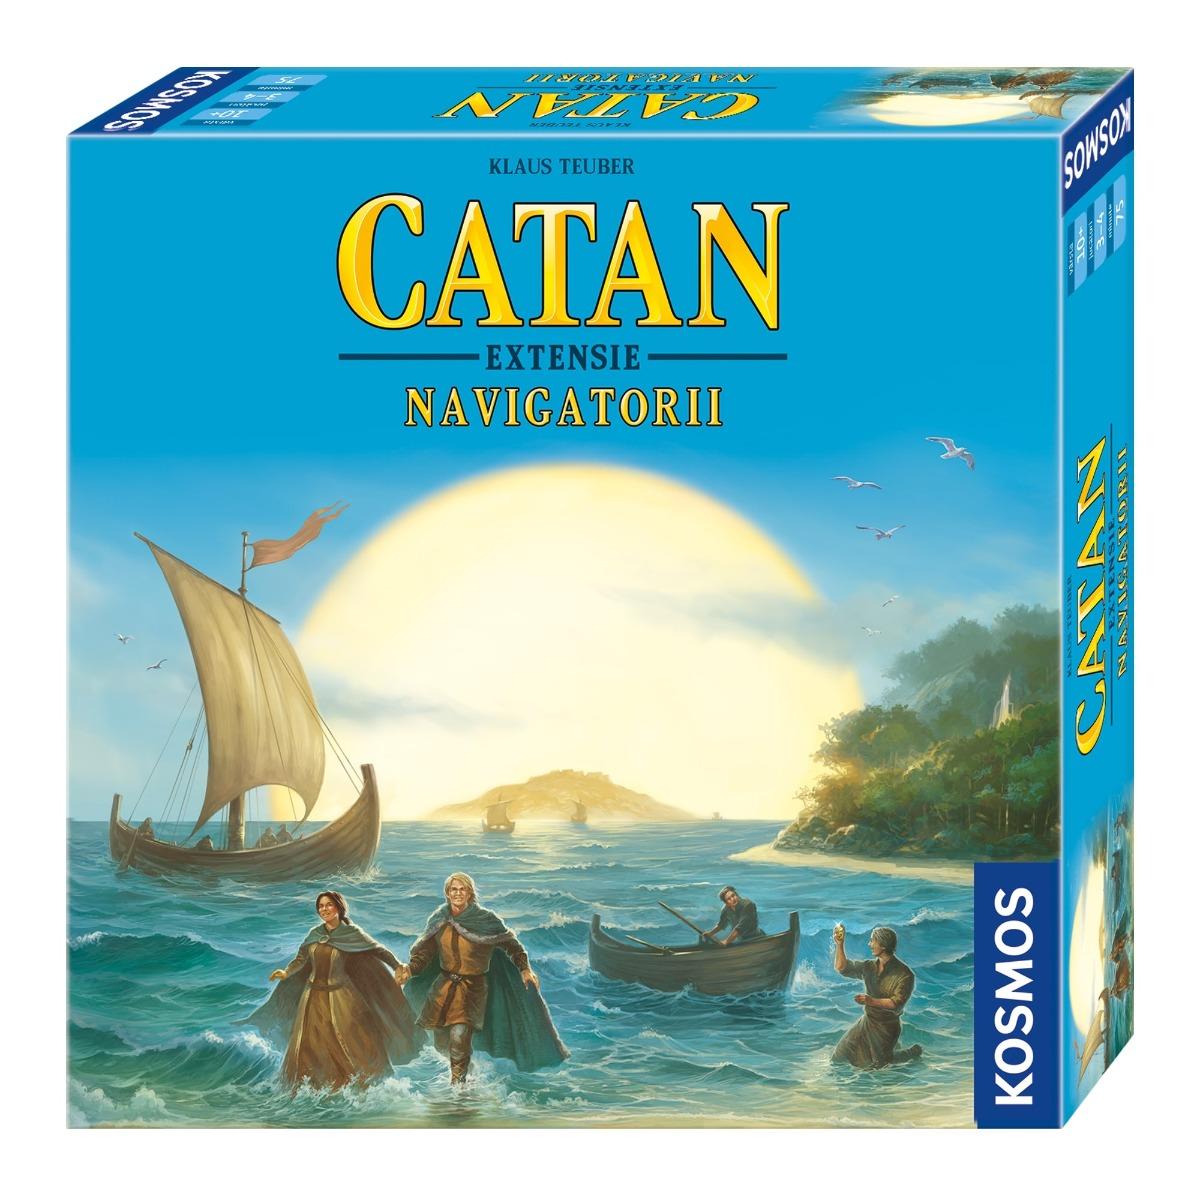 Joc Catan - Navigatorii, Editie noua 2015, Extensie, 3-4 Jucatori